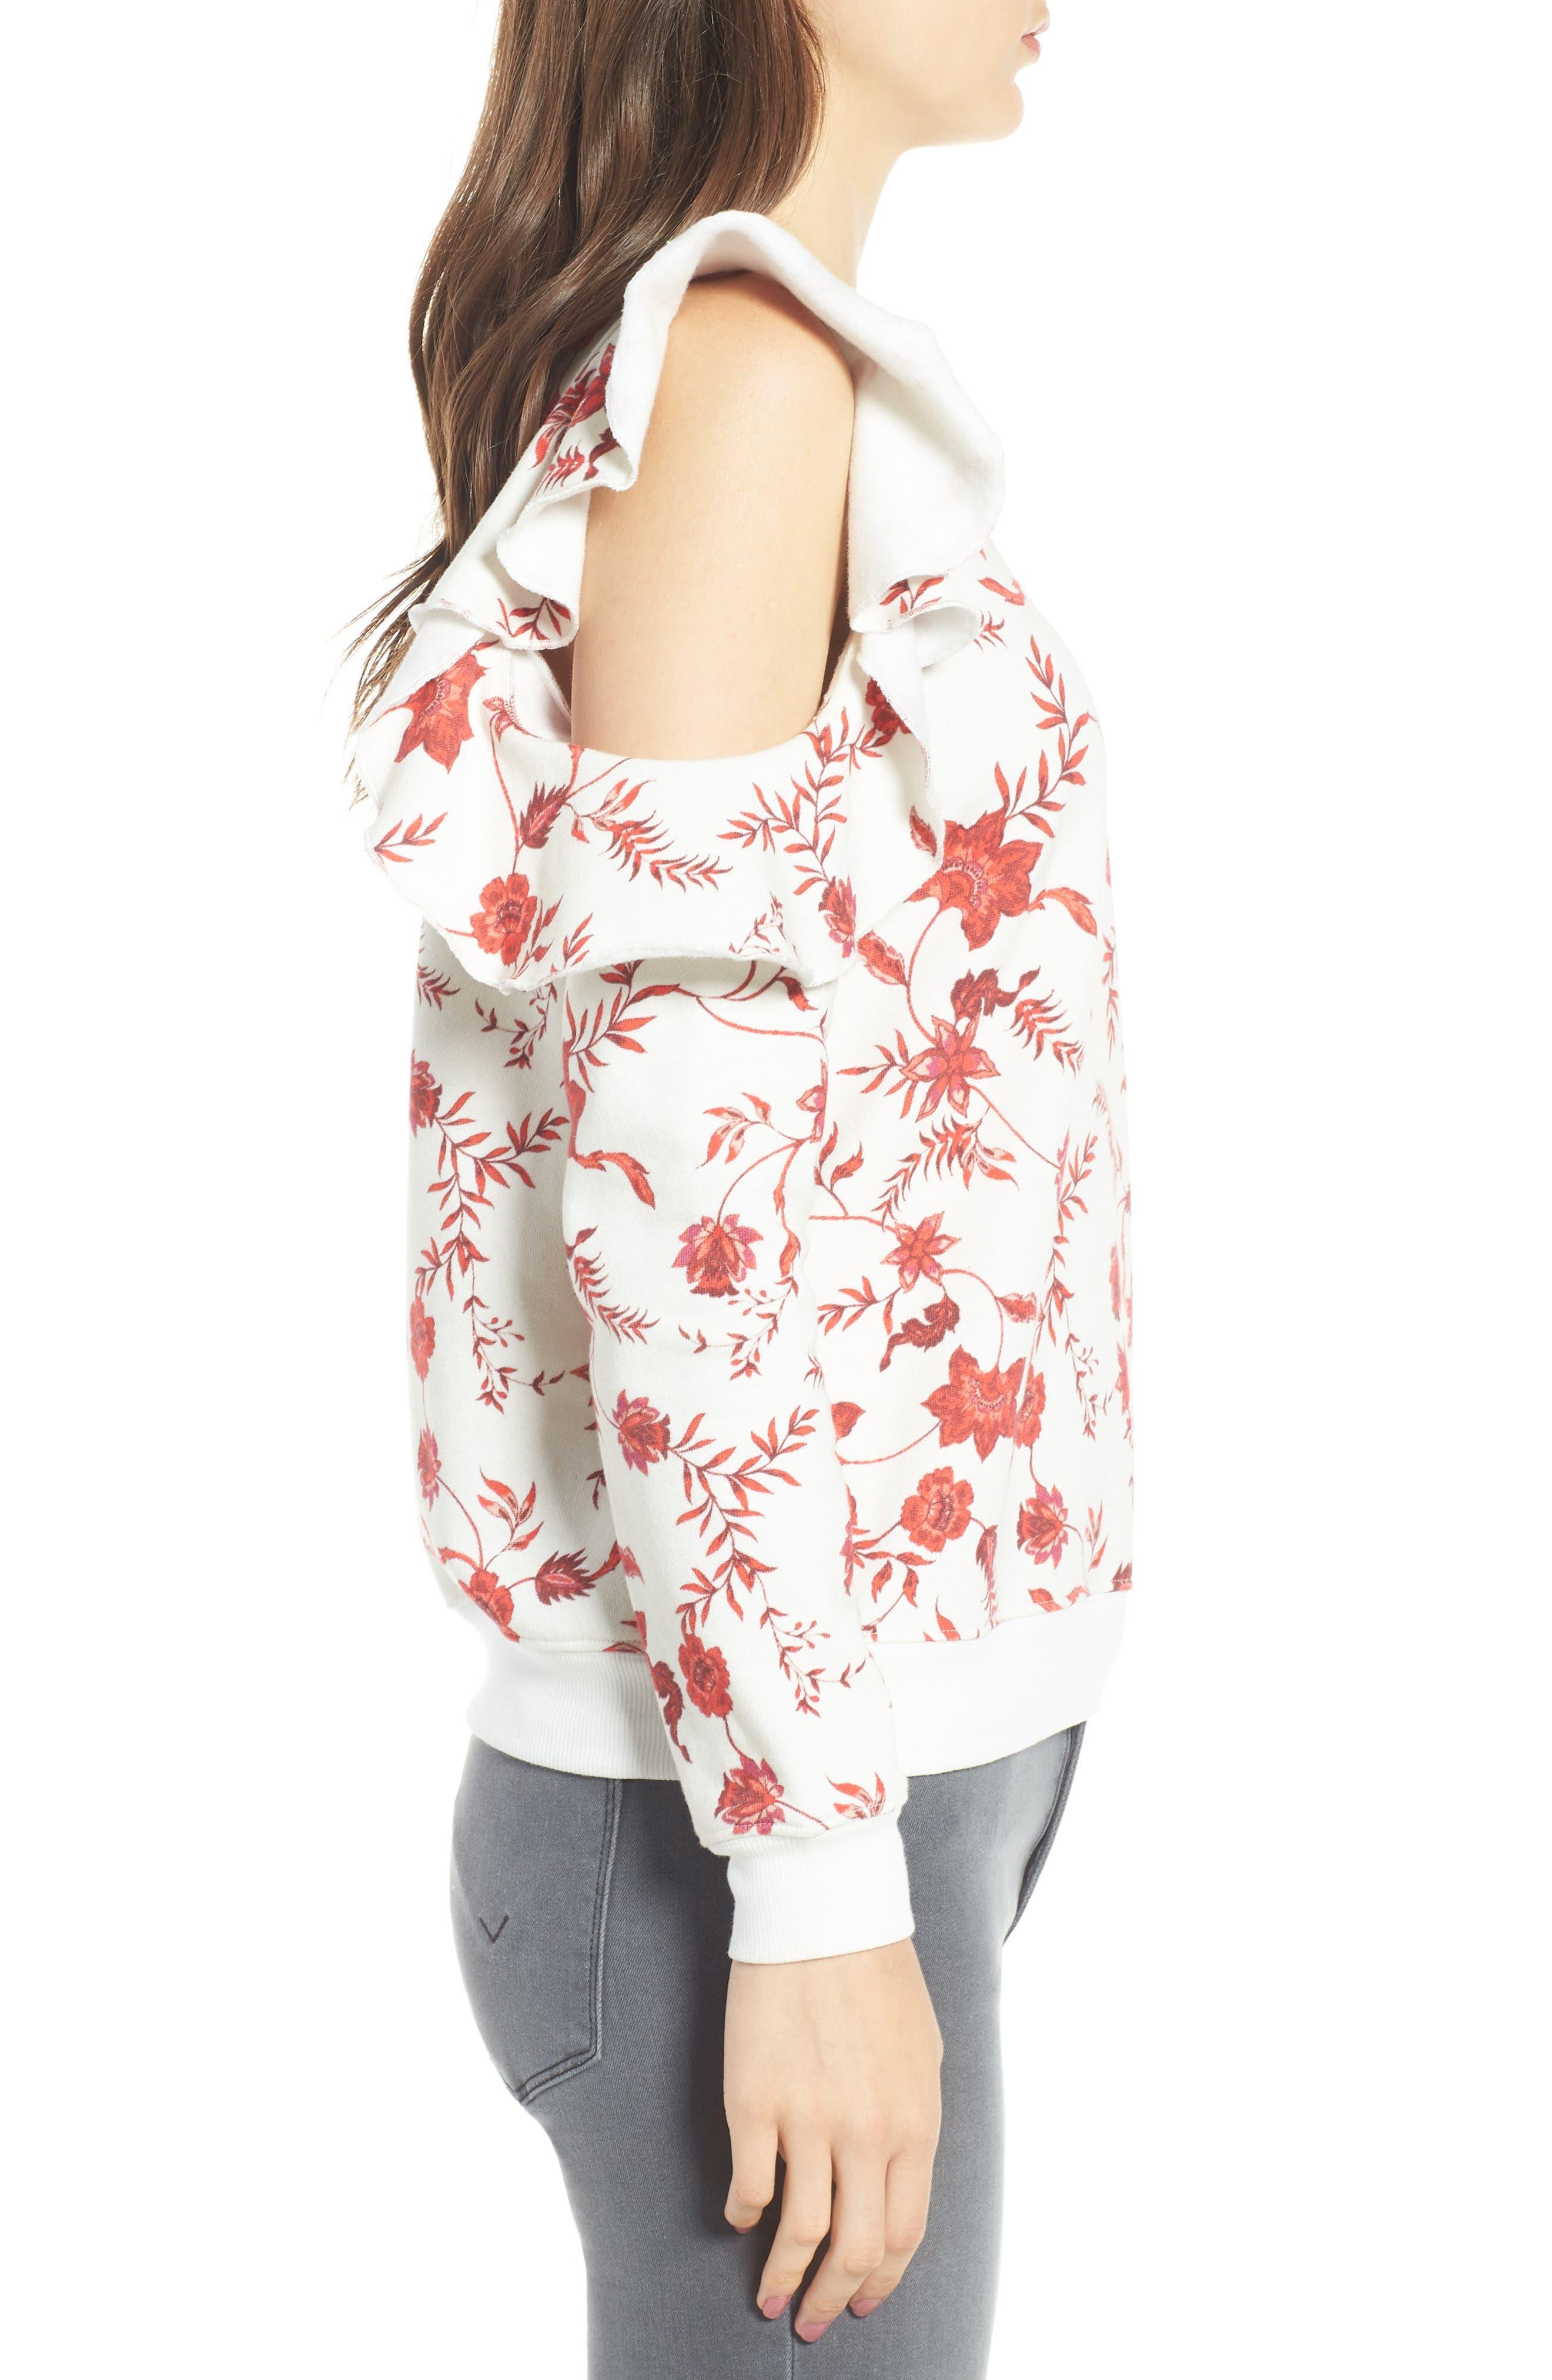 REBECCA MINKOFF,                             Gracie Cold Shoulder Floral Sweatshirt,                             Alternate thumbnail 3, color,                             900